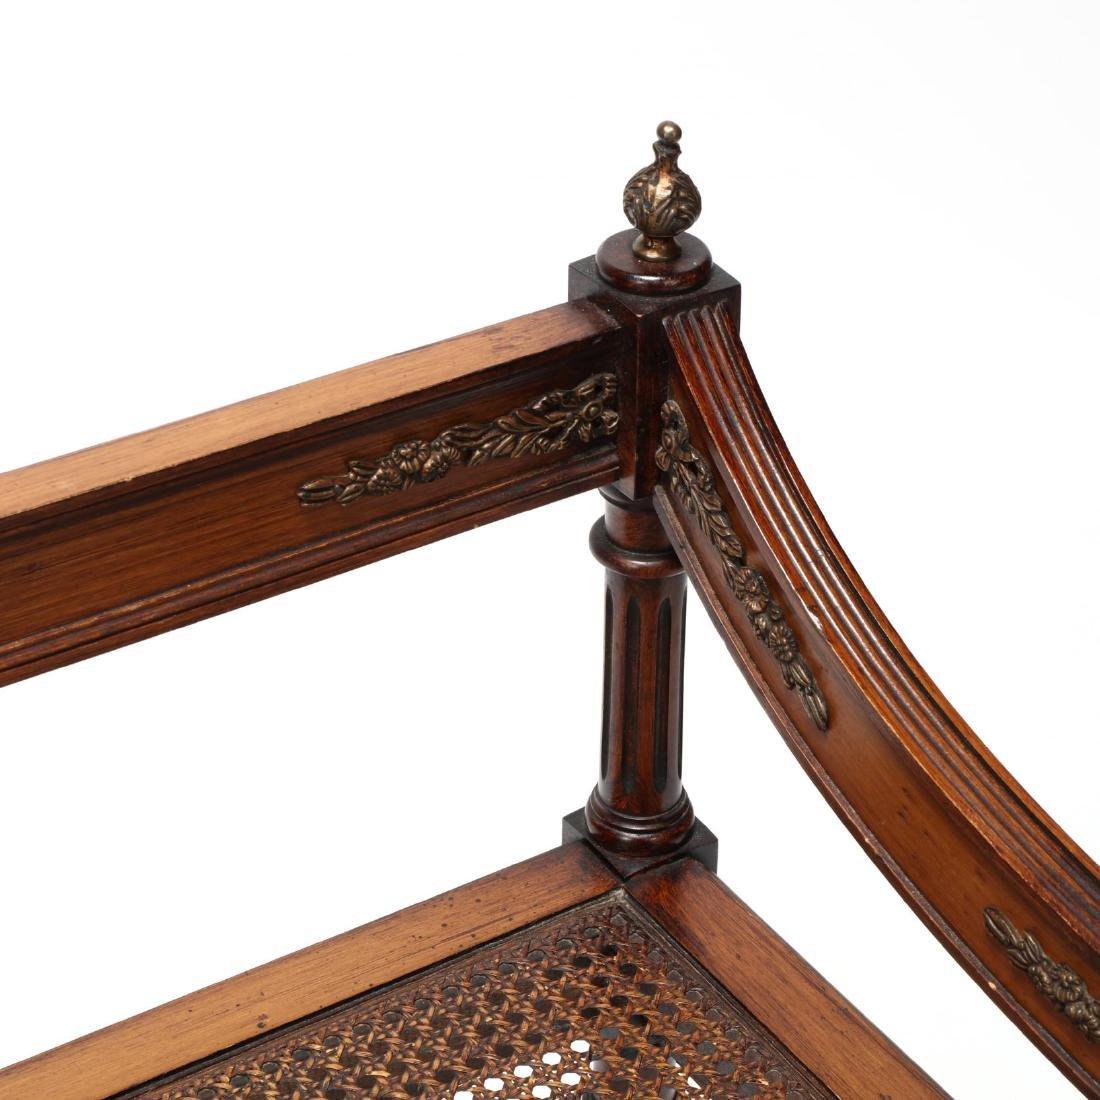 Louis XVI Style Cane Seat Settee - 3